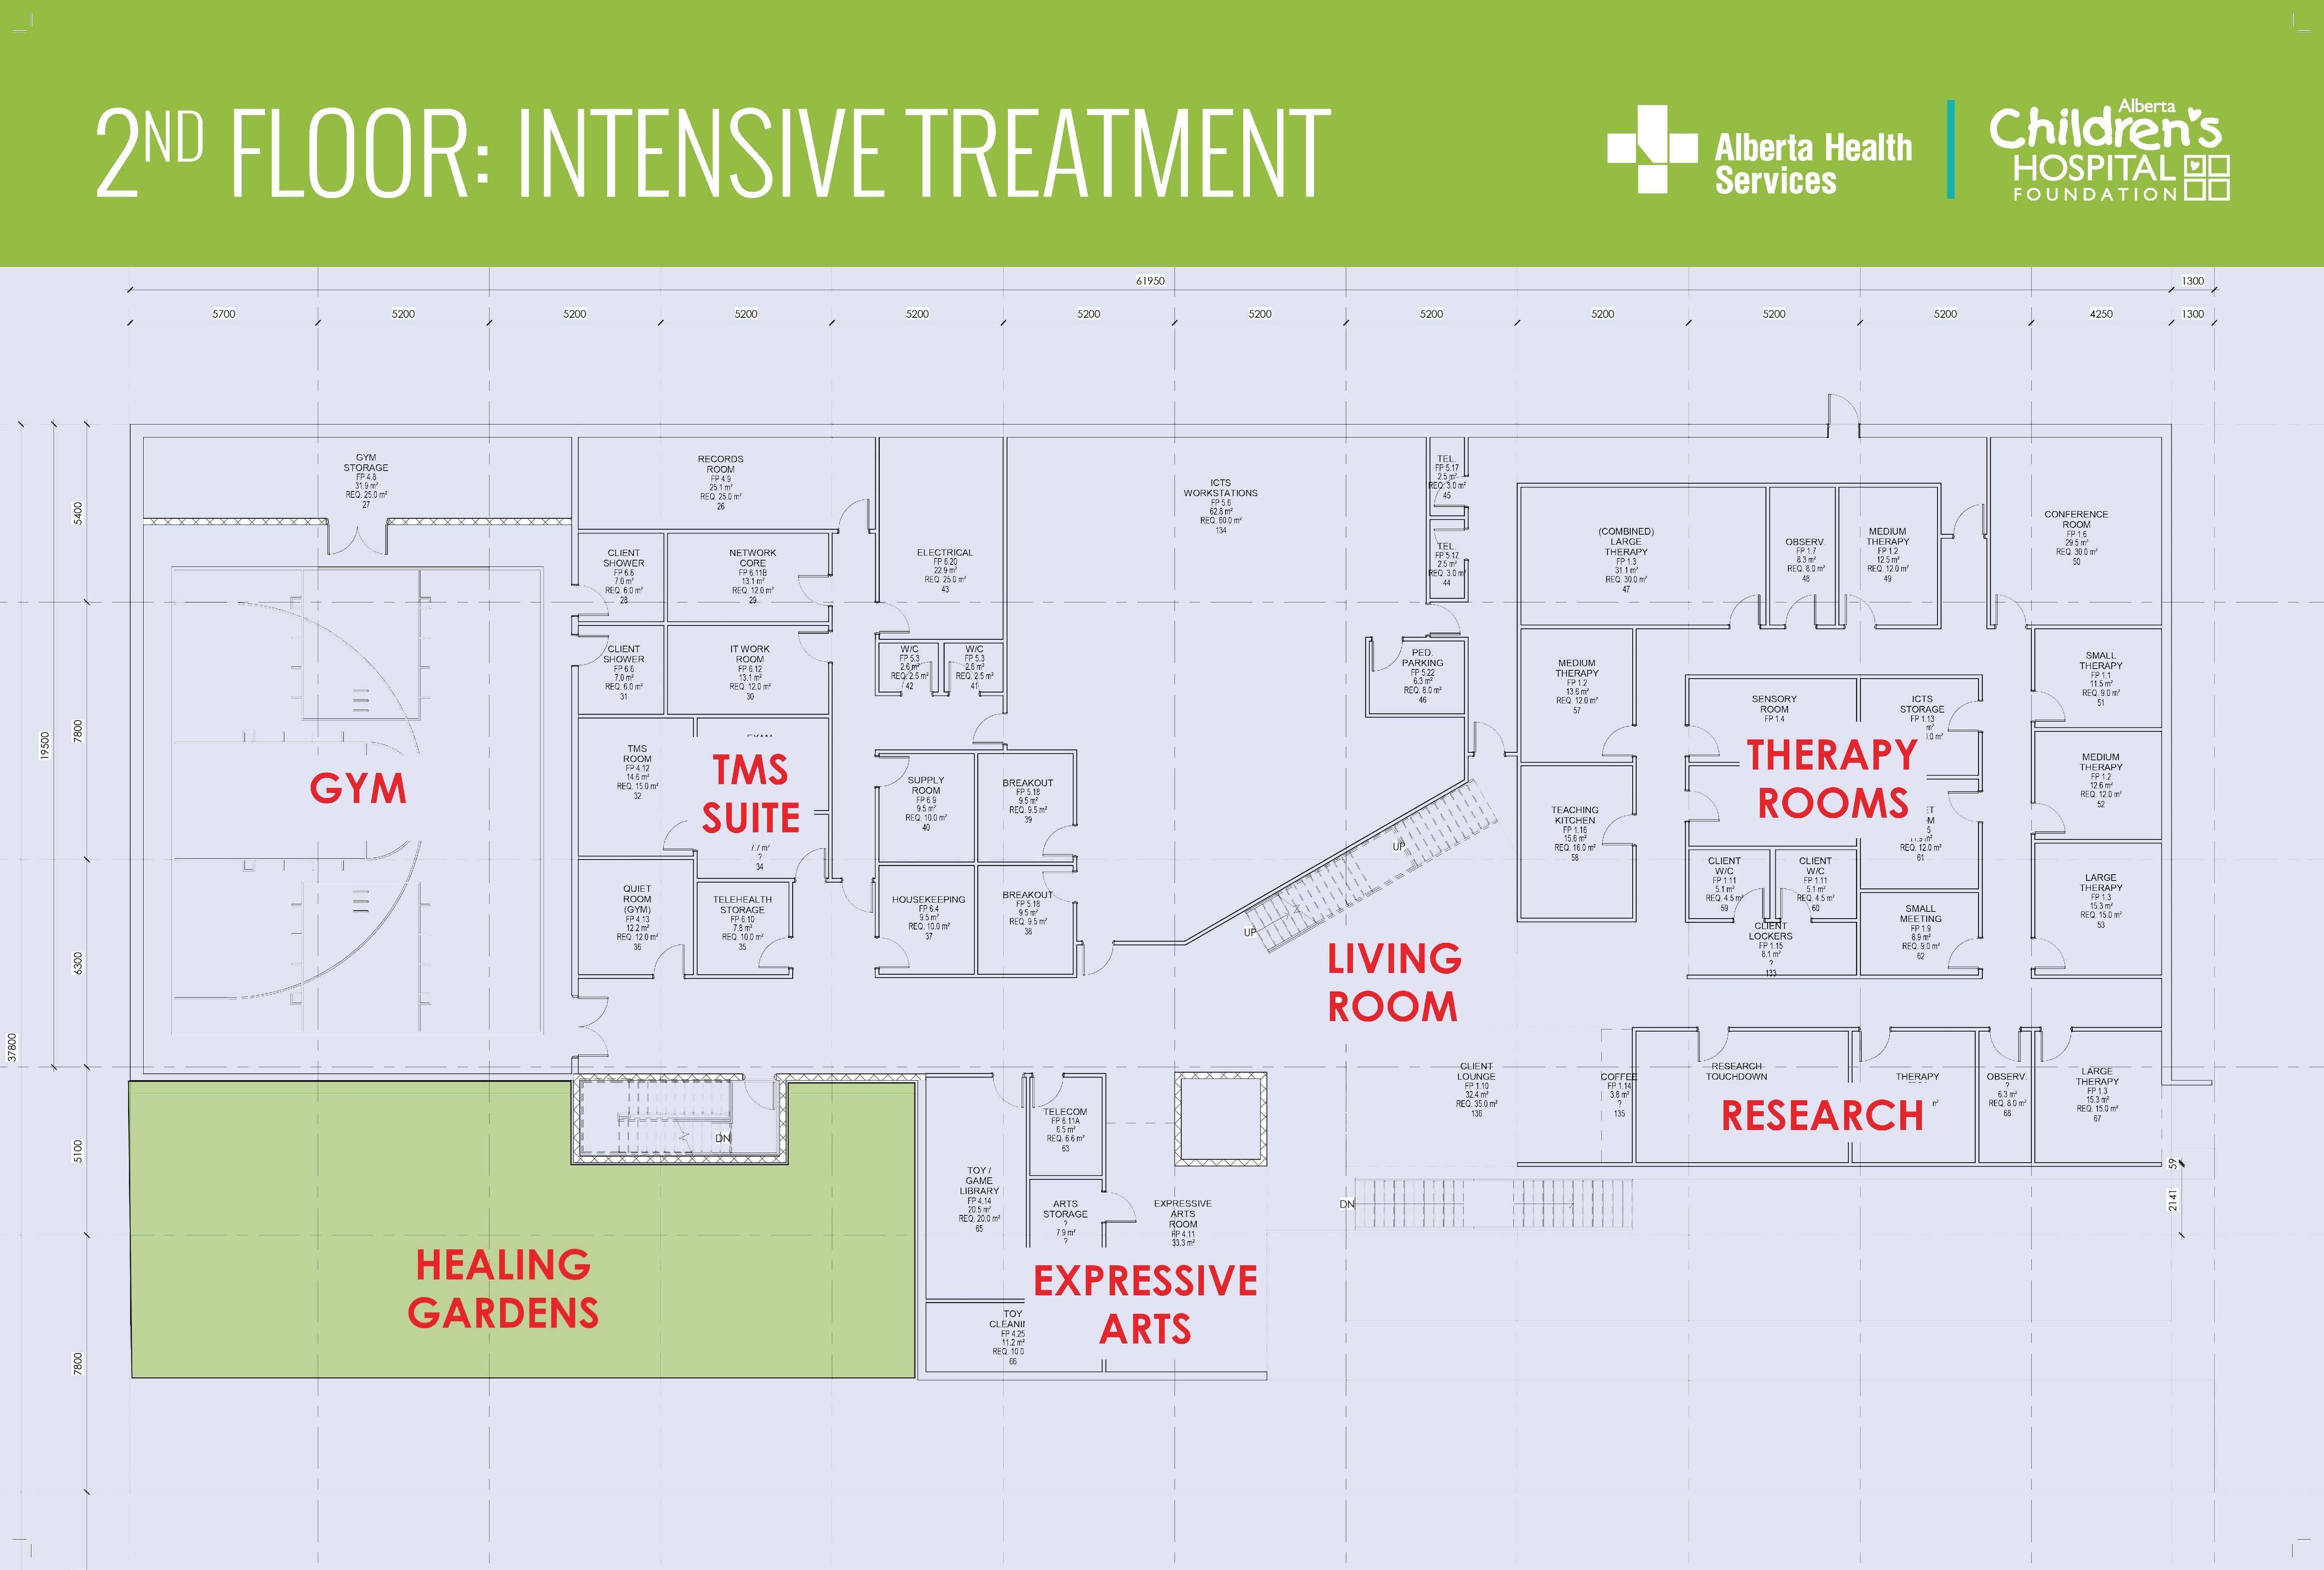 Intensive treatment service floor plan